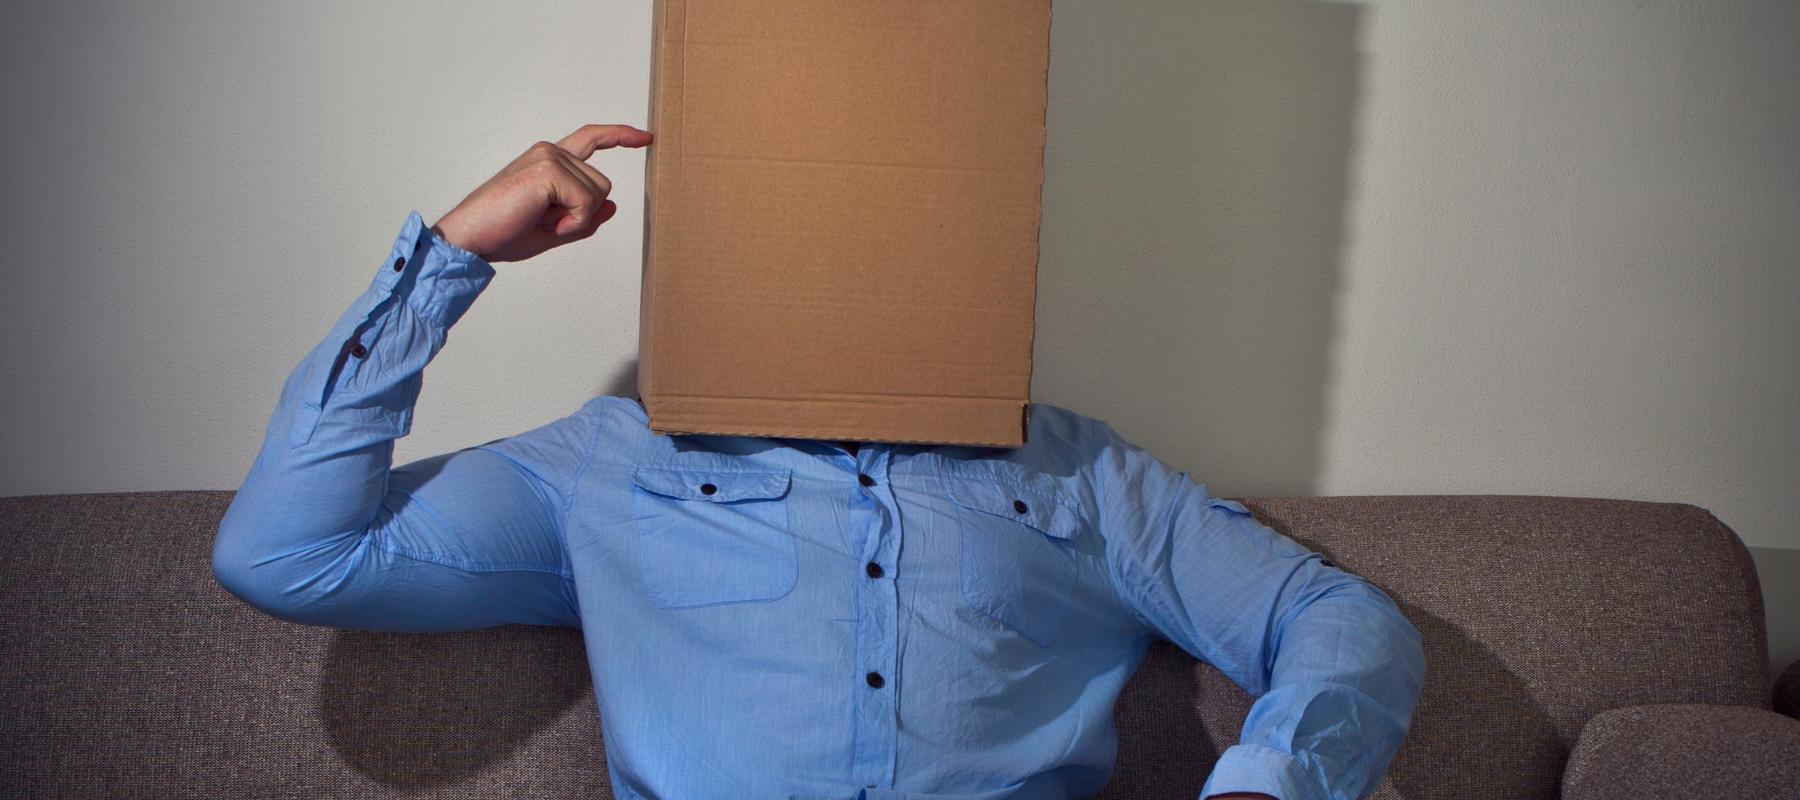 ich helfe dir out of the box zu denken